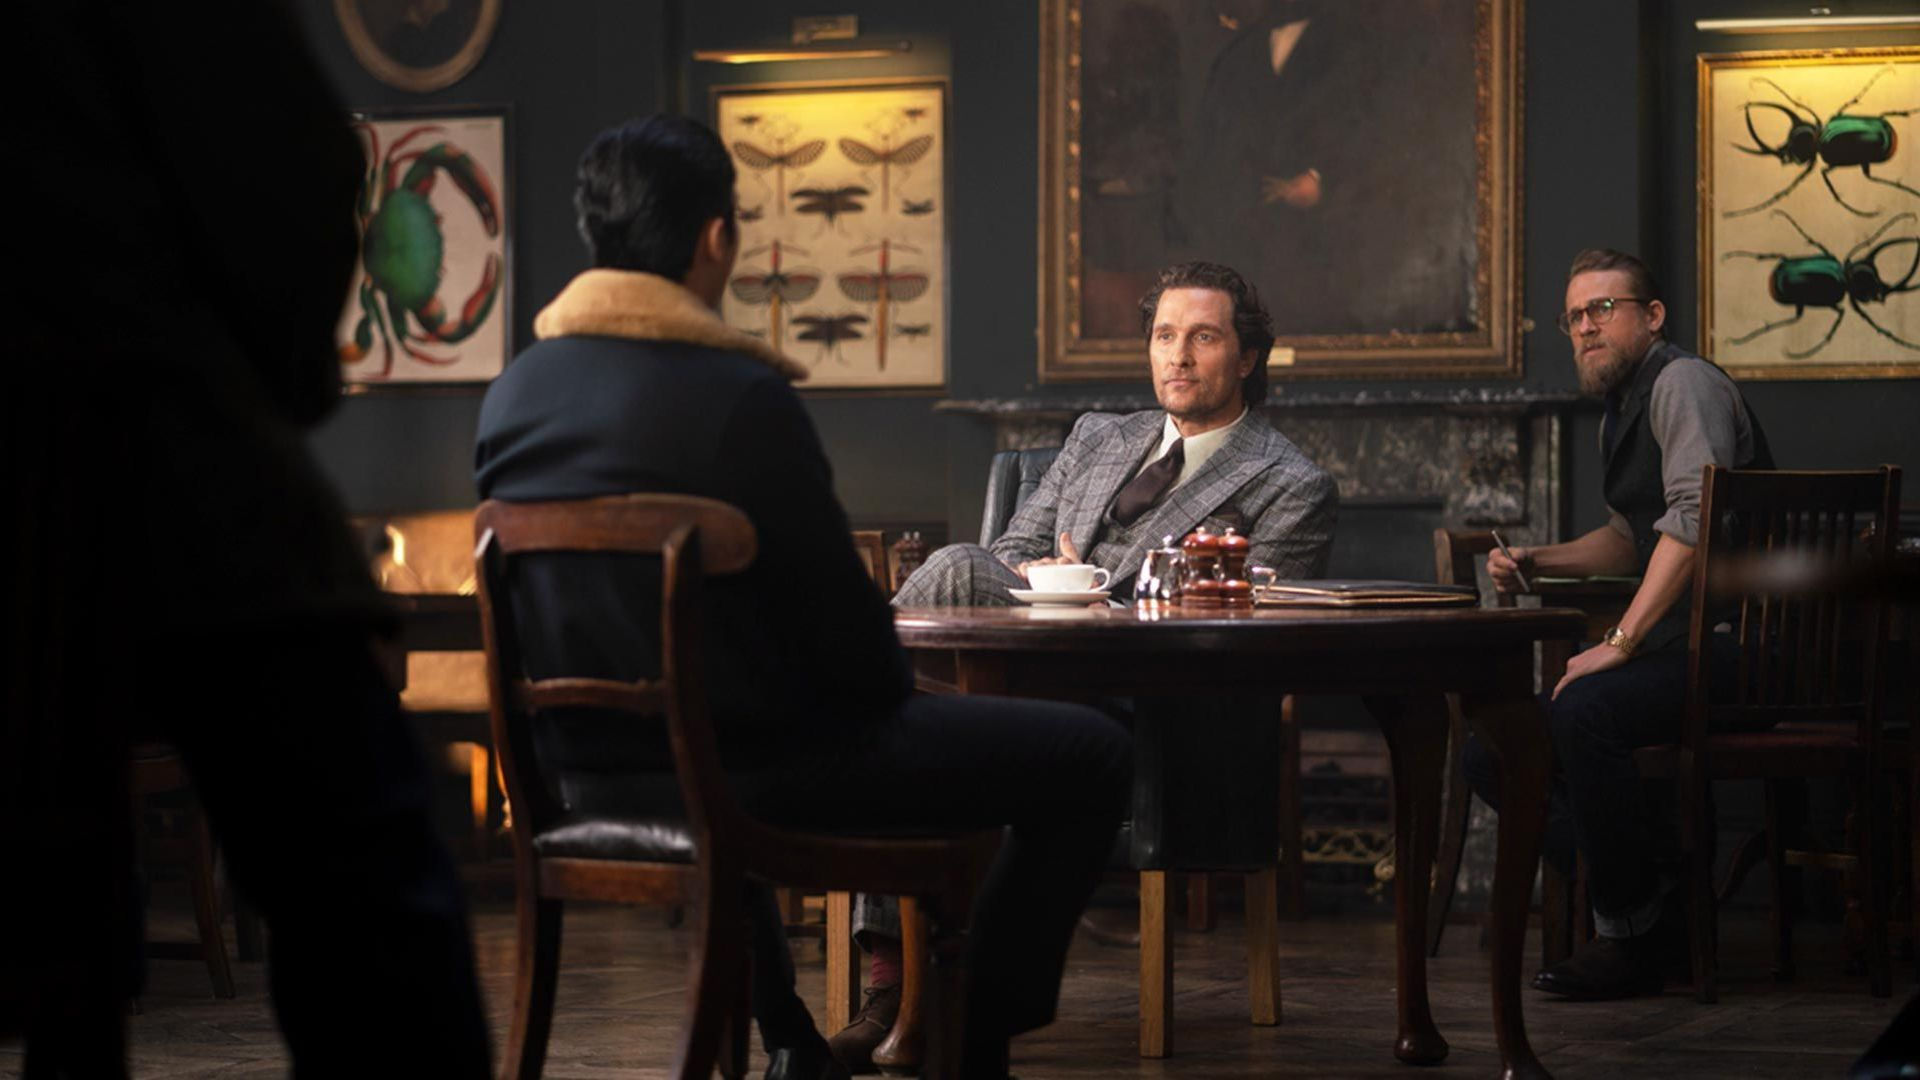 matthew-mcconaughey-the-gentlemen-cast-takes-the-whos-who-quiz